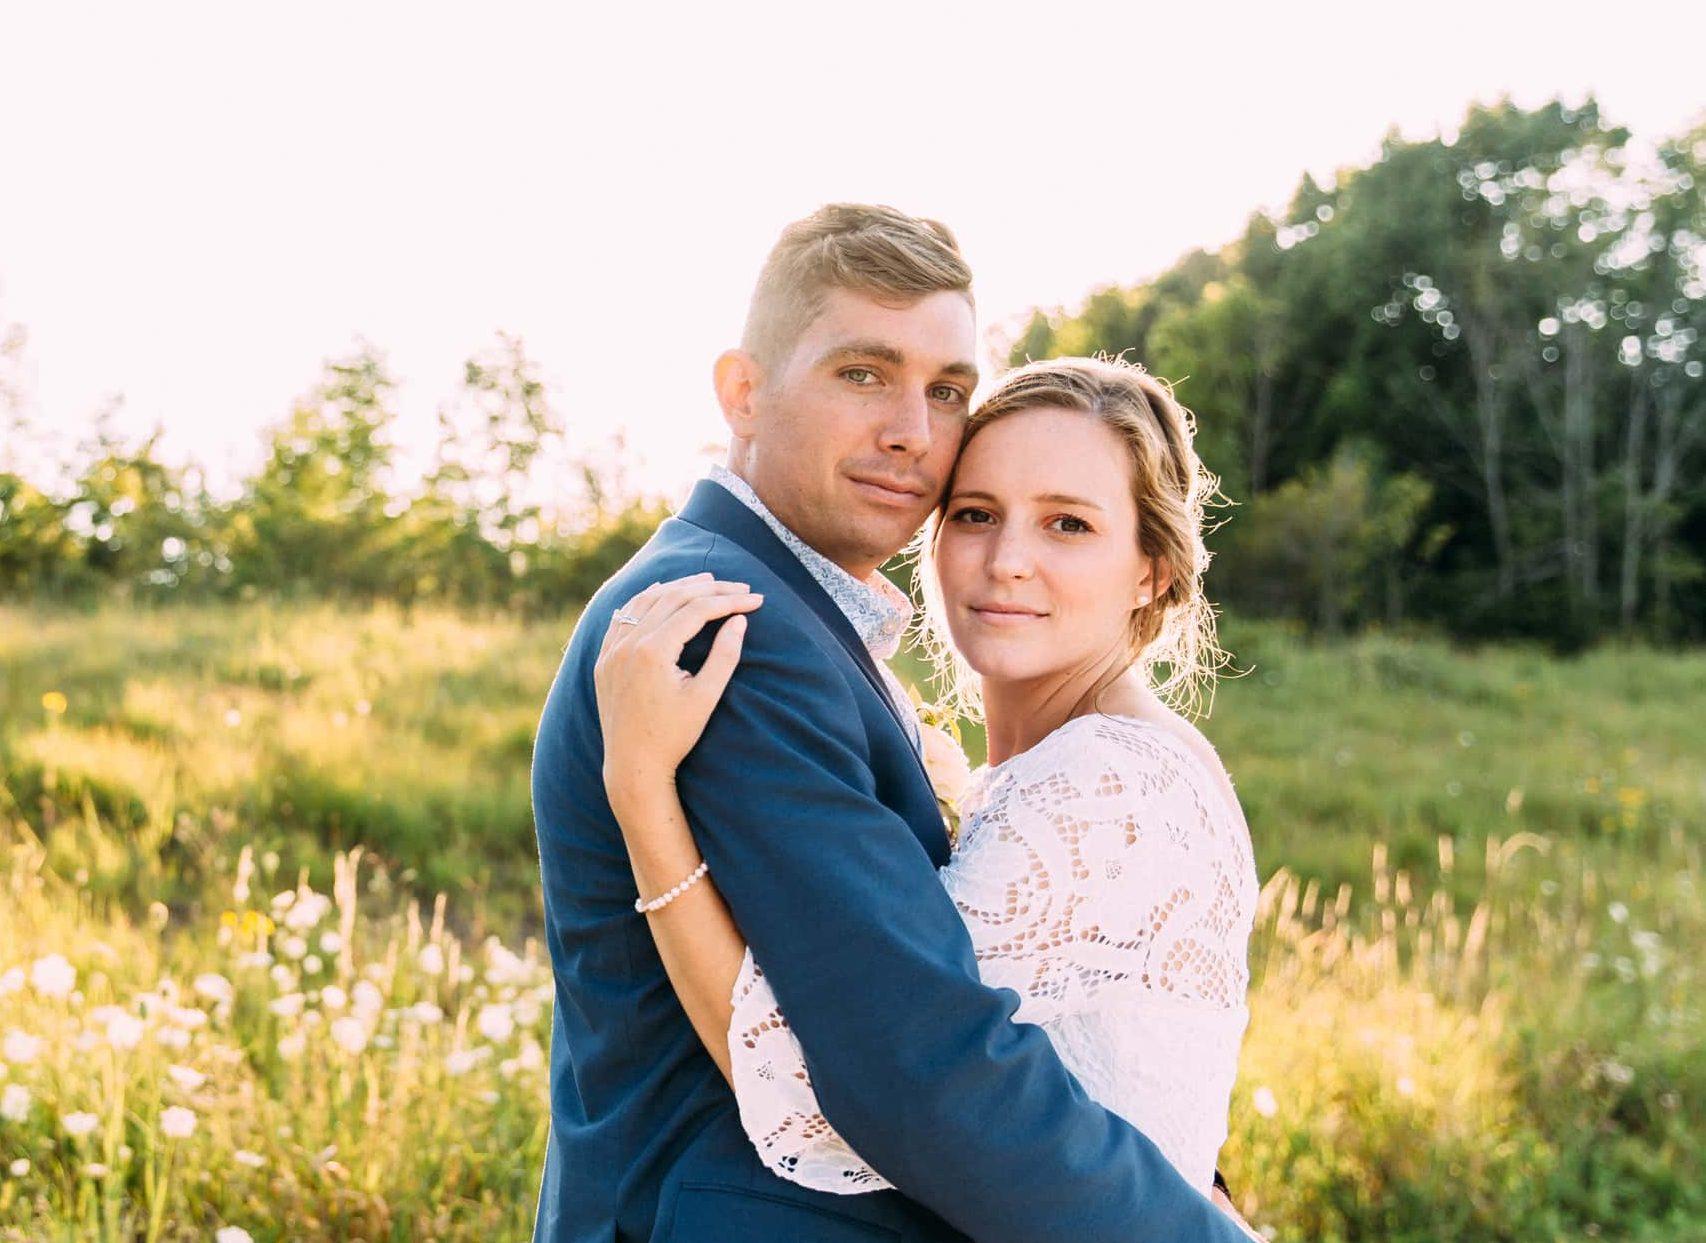 Milwaukee wedding -Lake Vista Park - Double You Photography-Kat Wegrzyniak